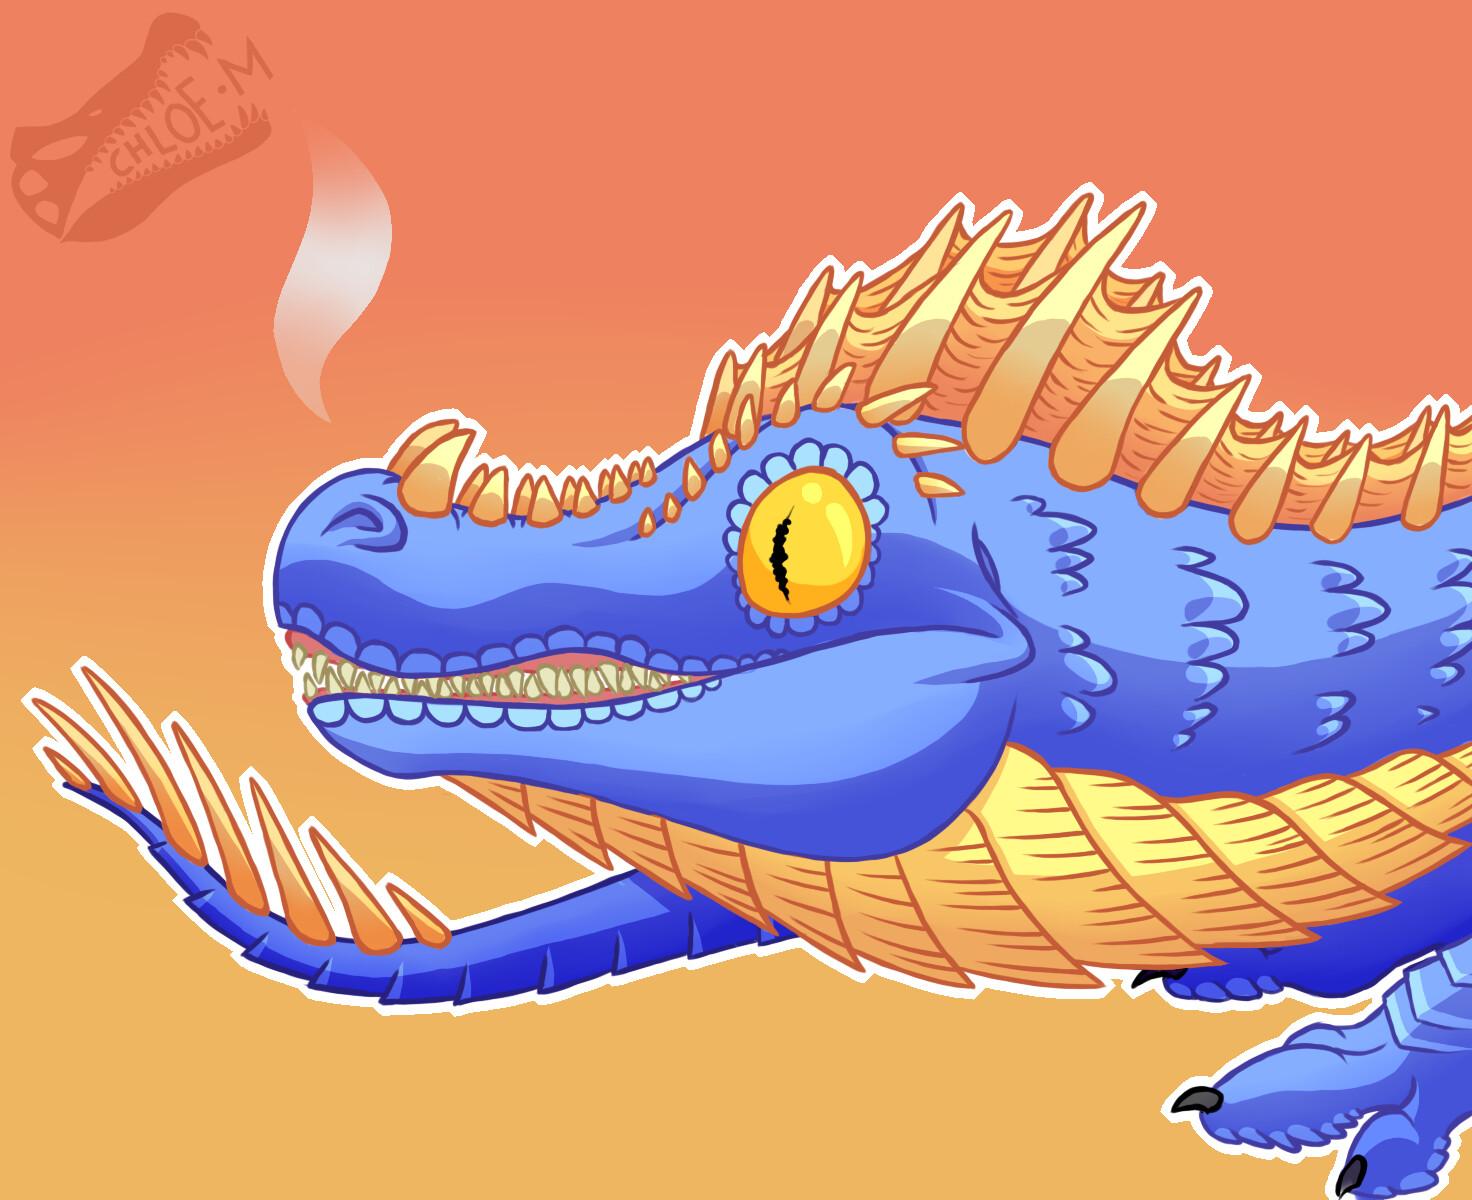 Chloe mccann dragon 2